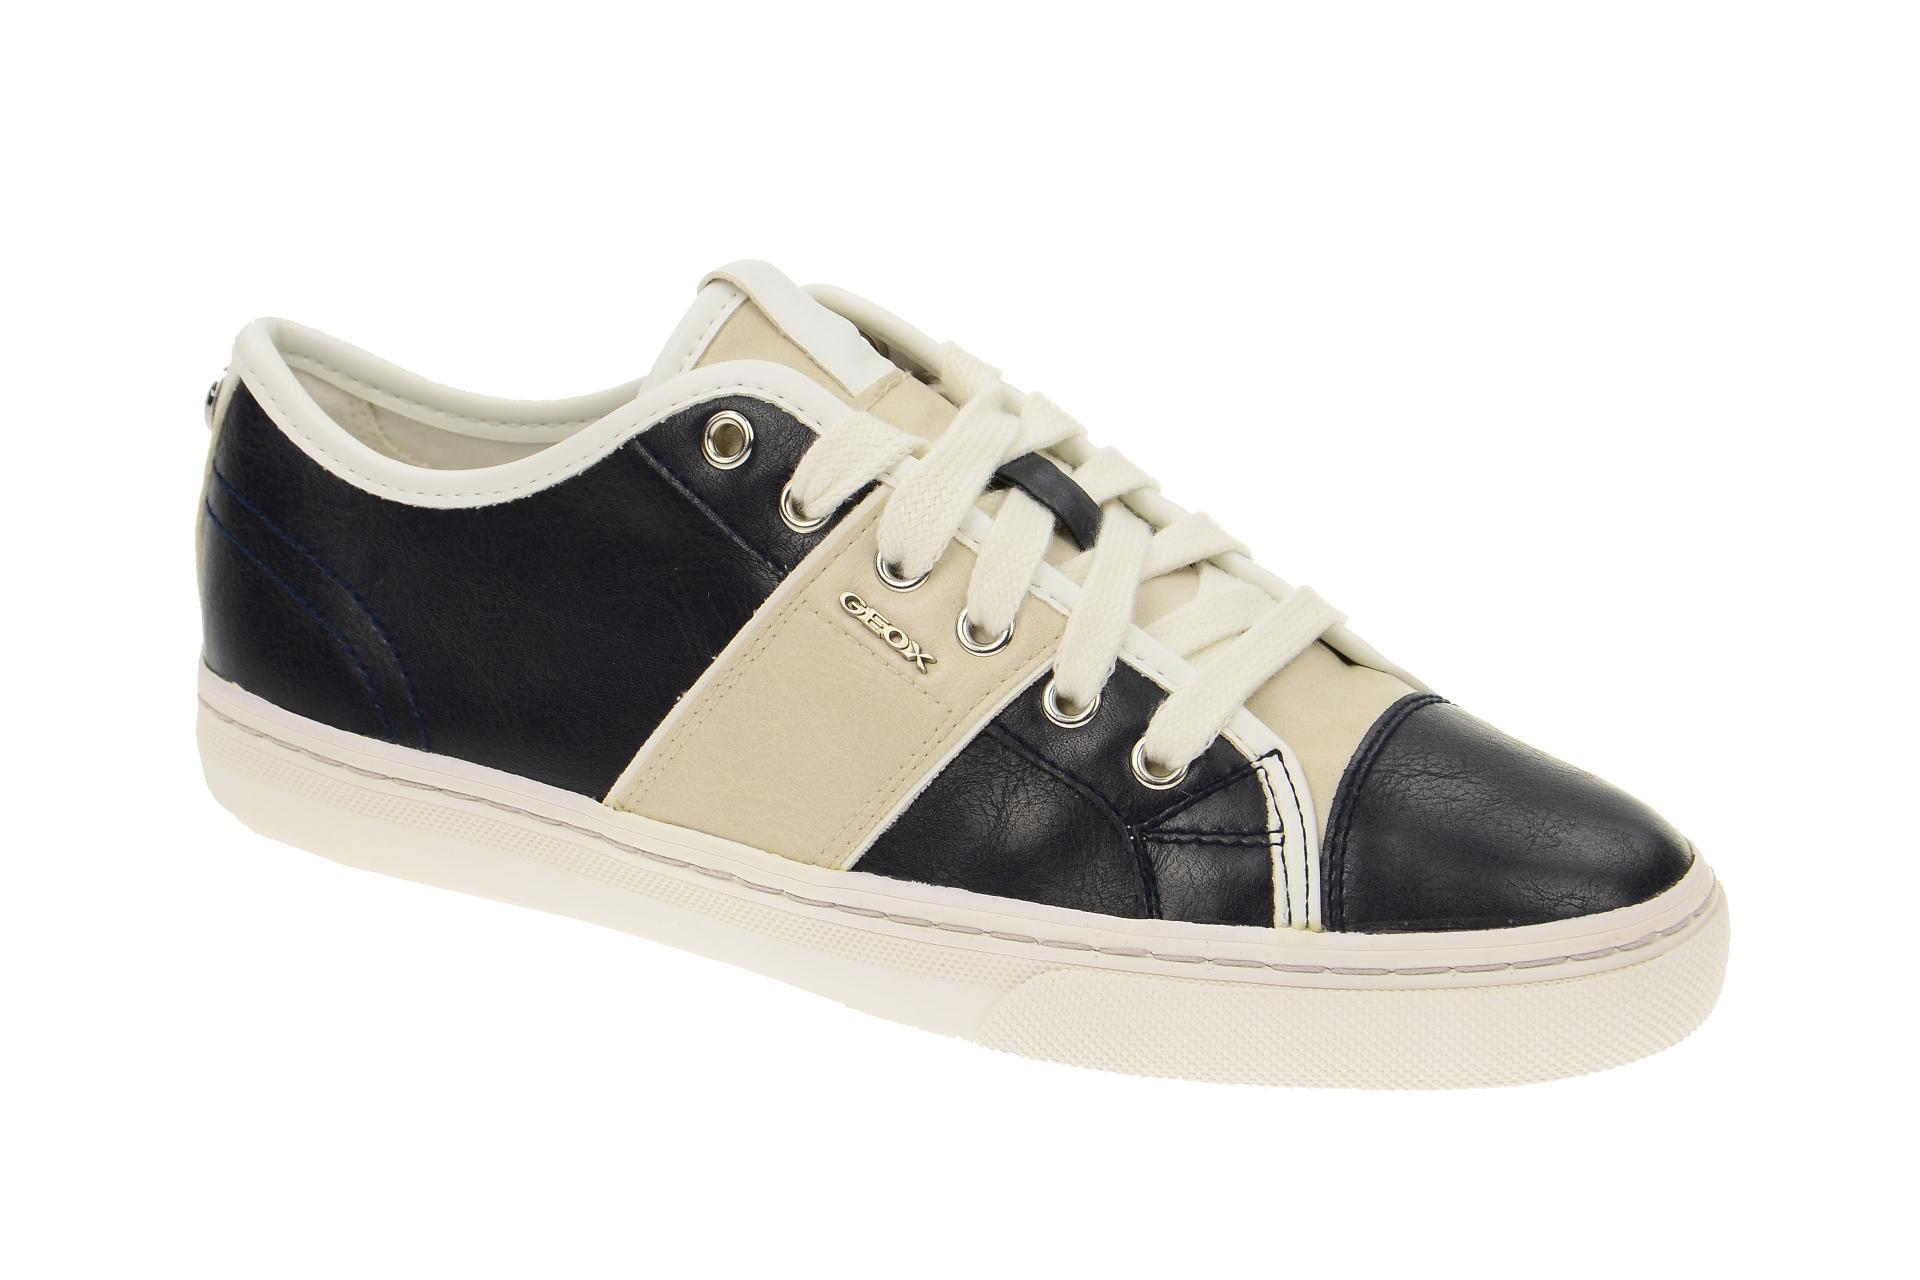 Geox MYRIA Damenschuhe Halbschuhe Sneaker blau NEU